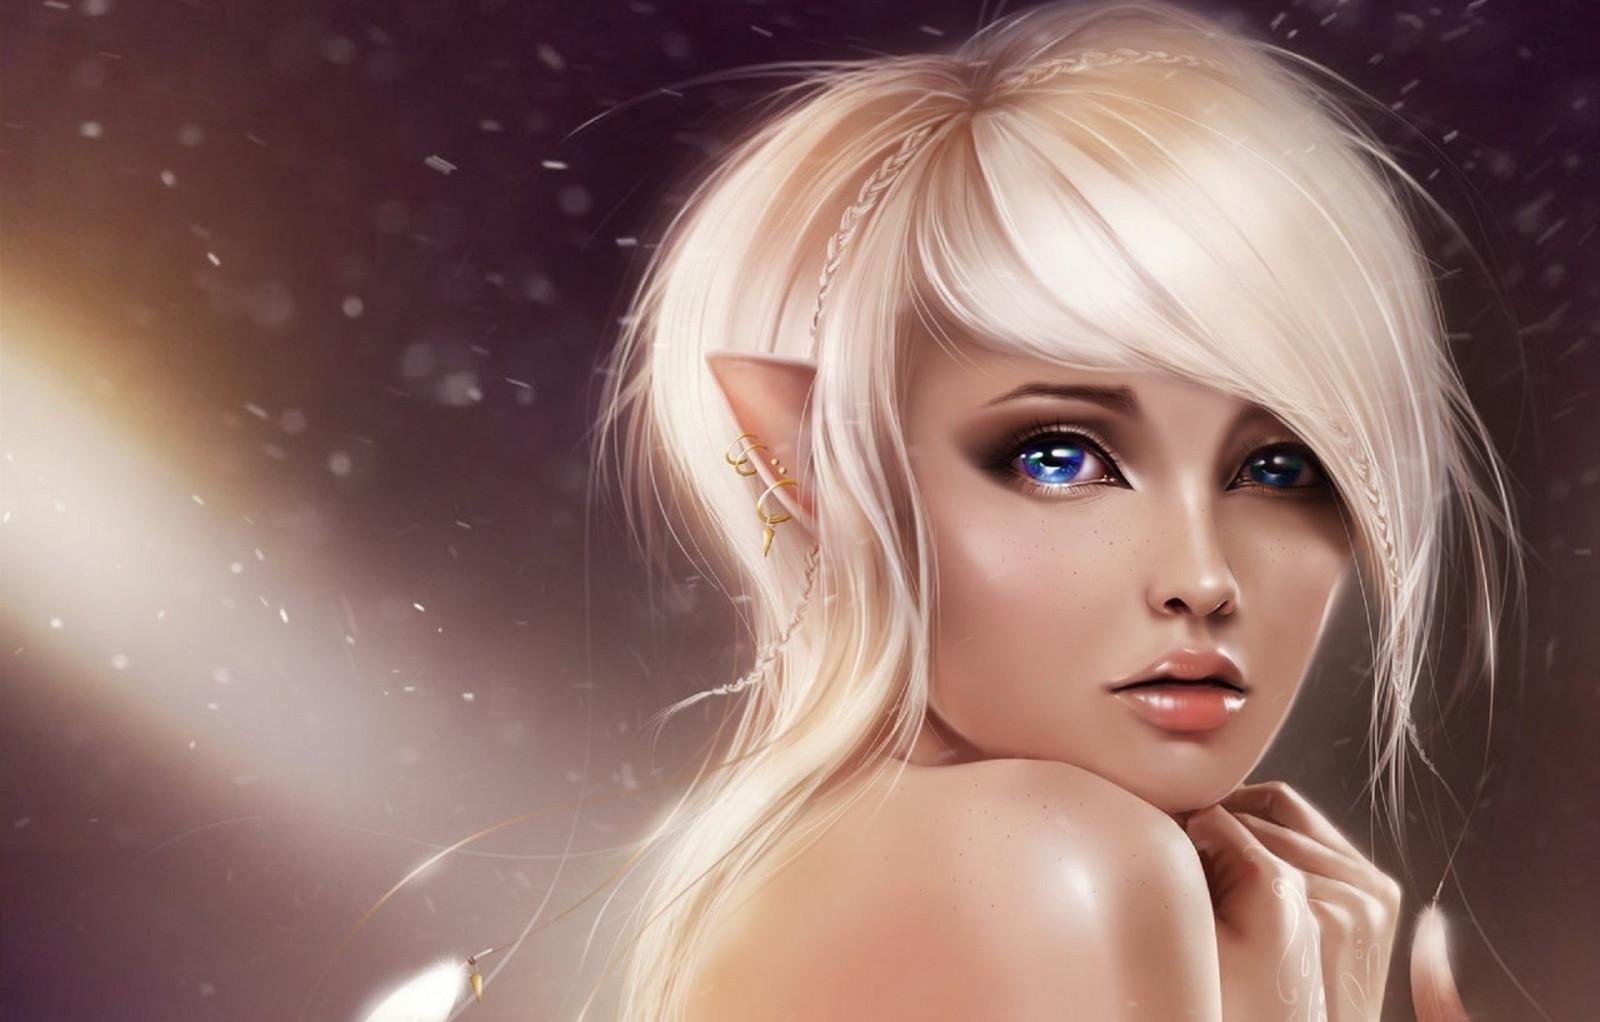 wallpaper digital art women model blonde long hair